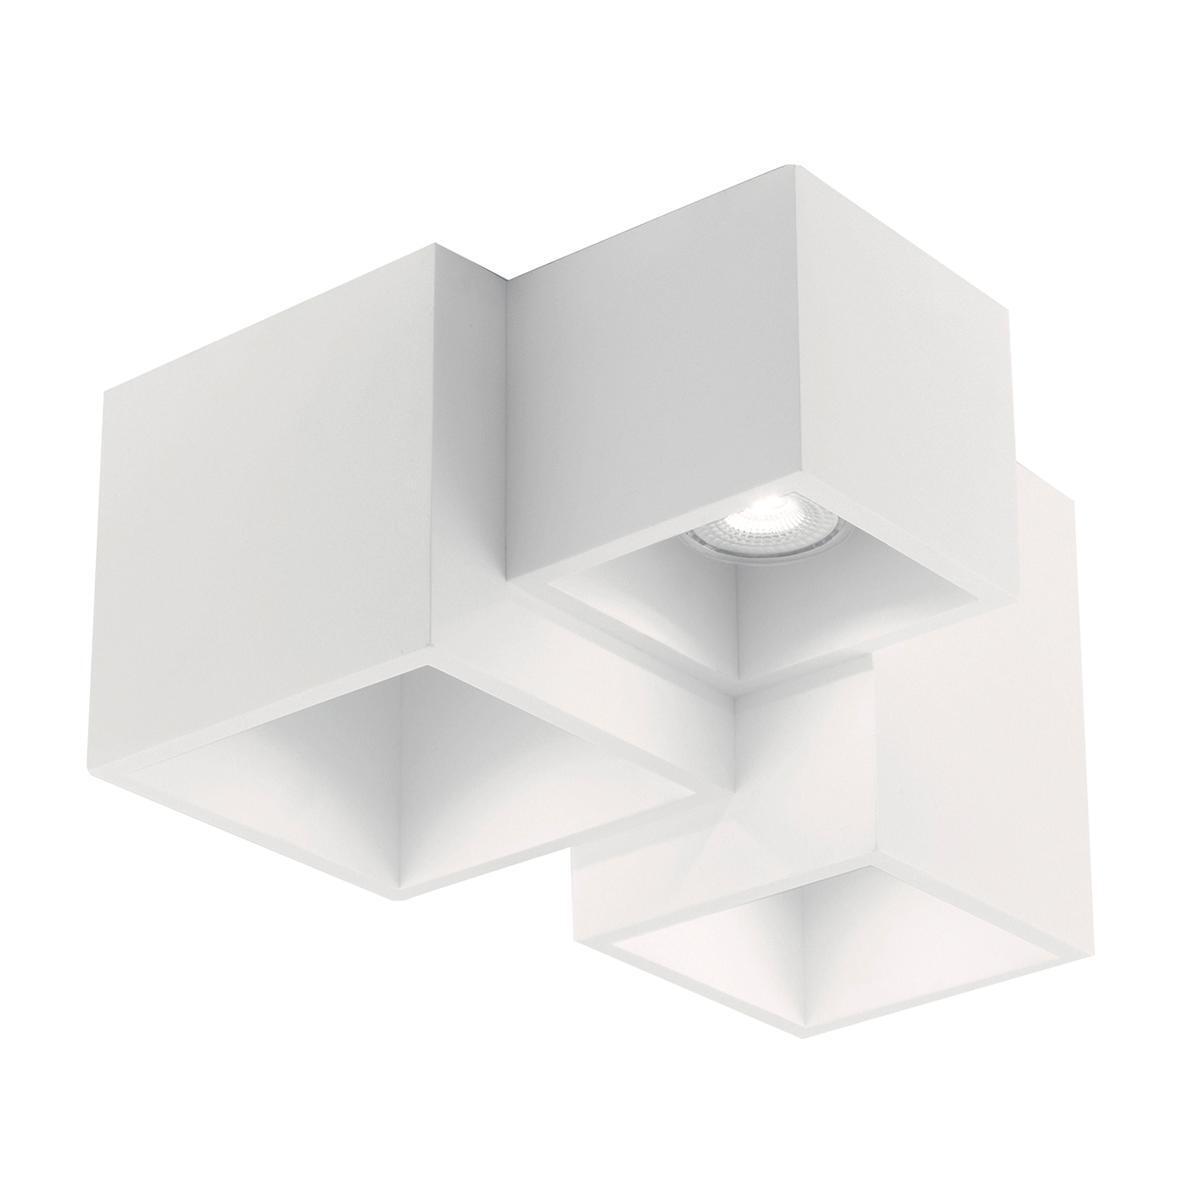 Plafoniera design Foster bianco, in gesso, 3 luci INTEC - 1